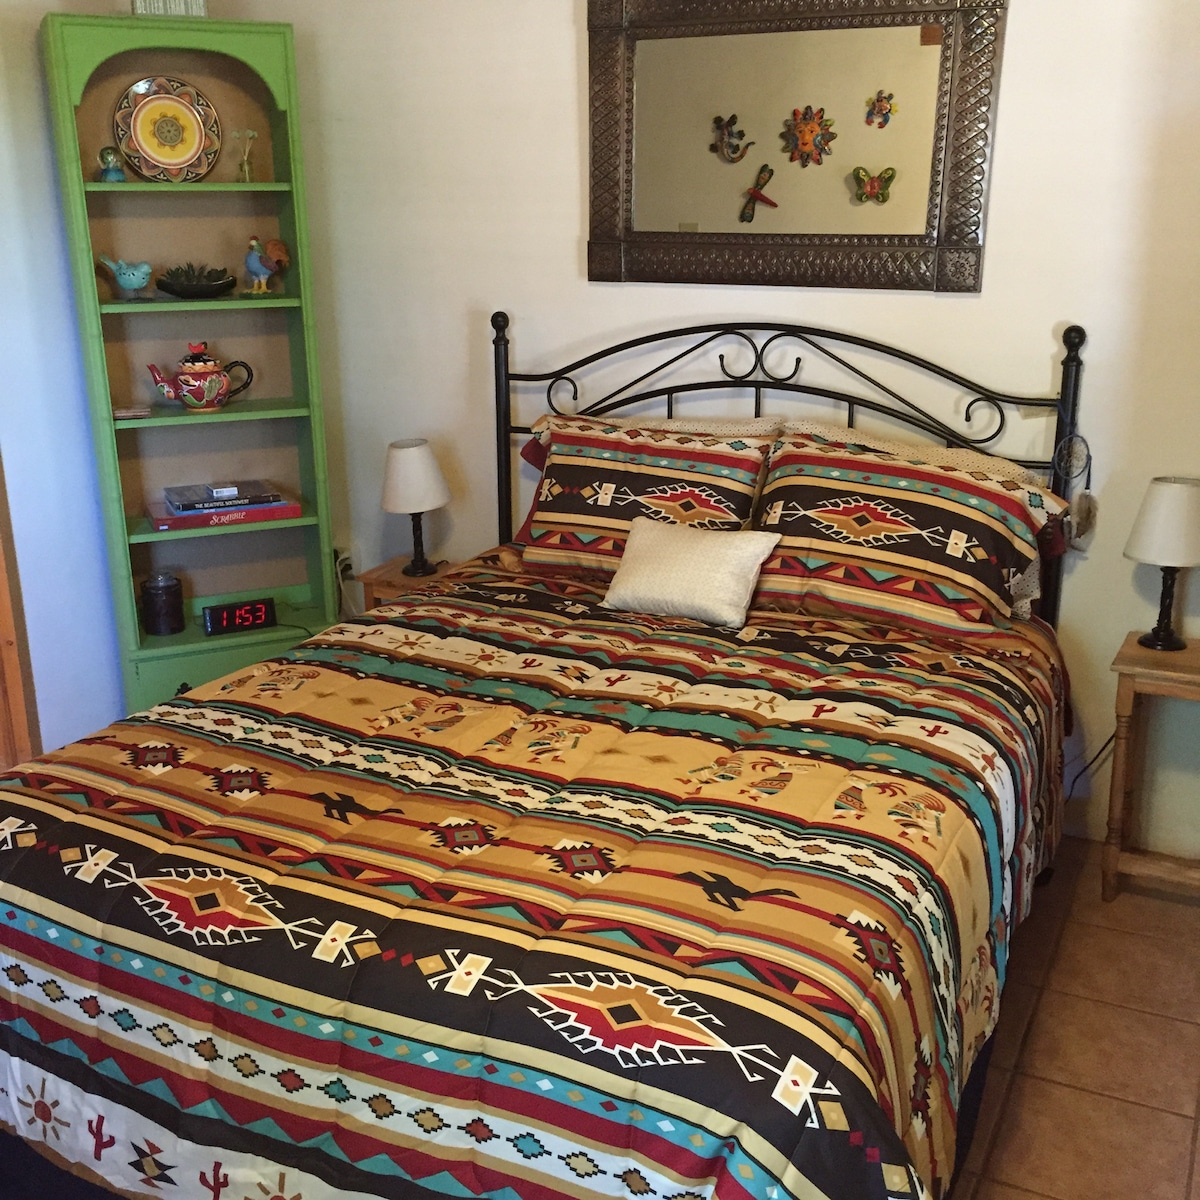 mesilla top 20 mesilla vacation rentals vacation homes u0026 condo rentals airbnb mesilla new mexico united states